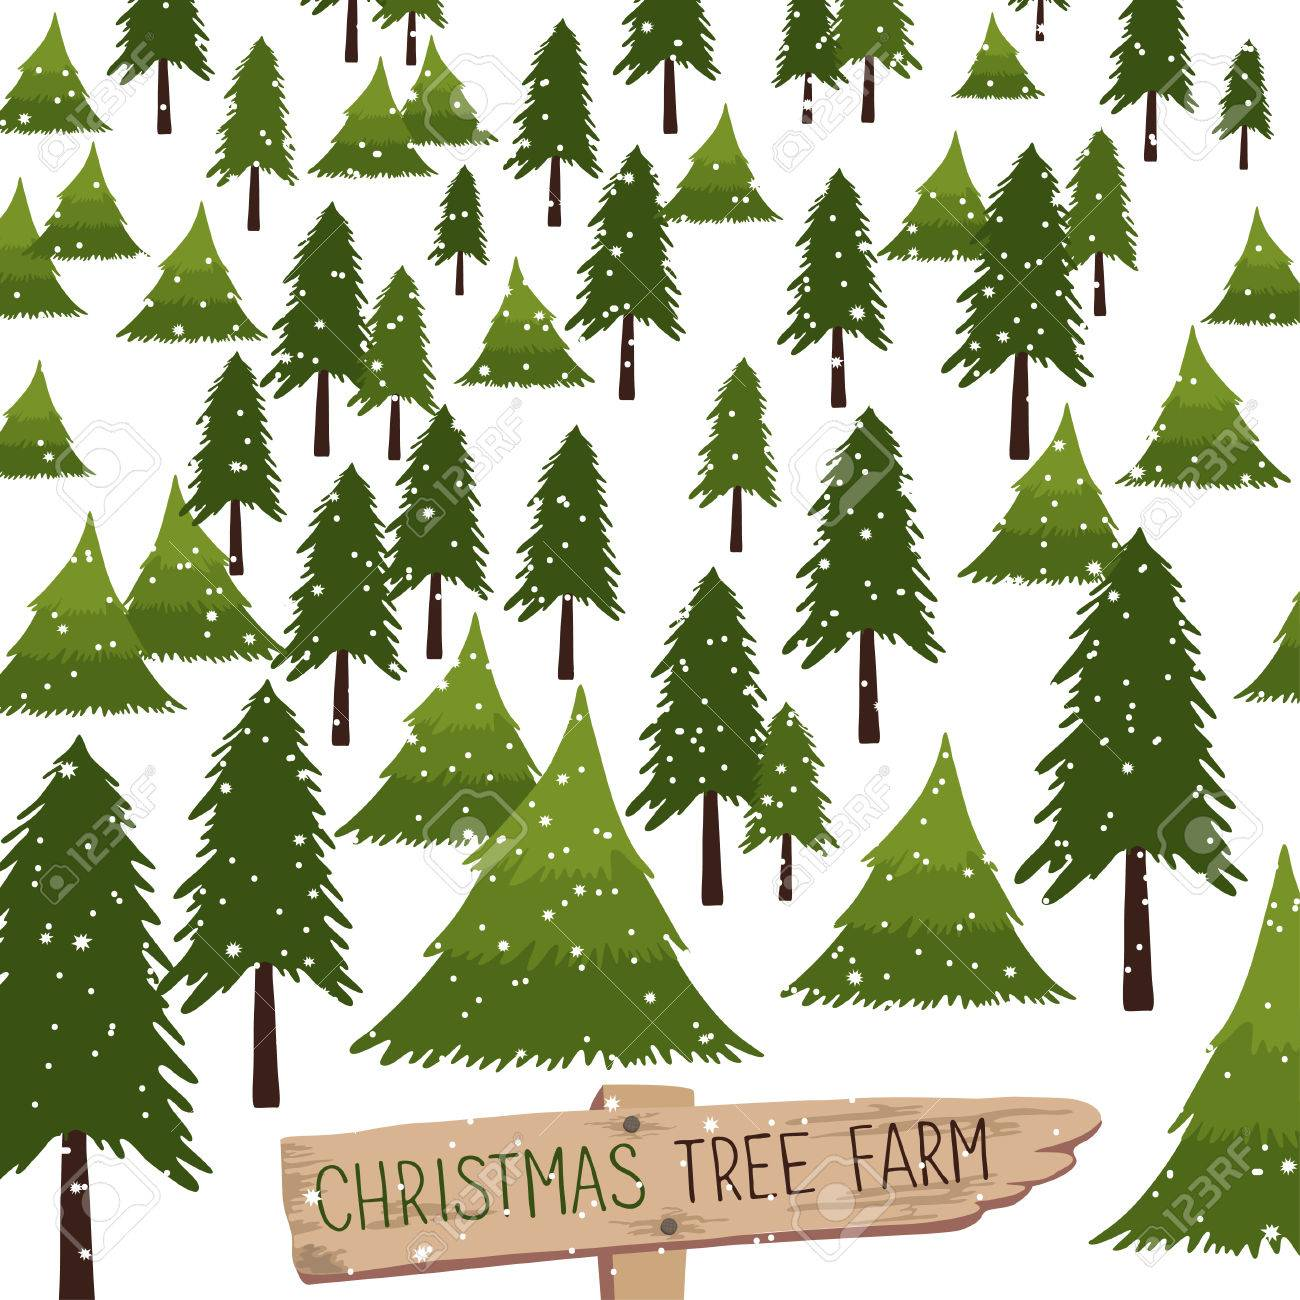 Christmas tree farm. Vector illustration. Christmas Trees for...